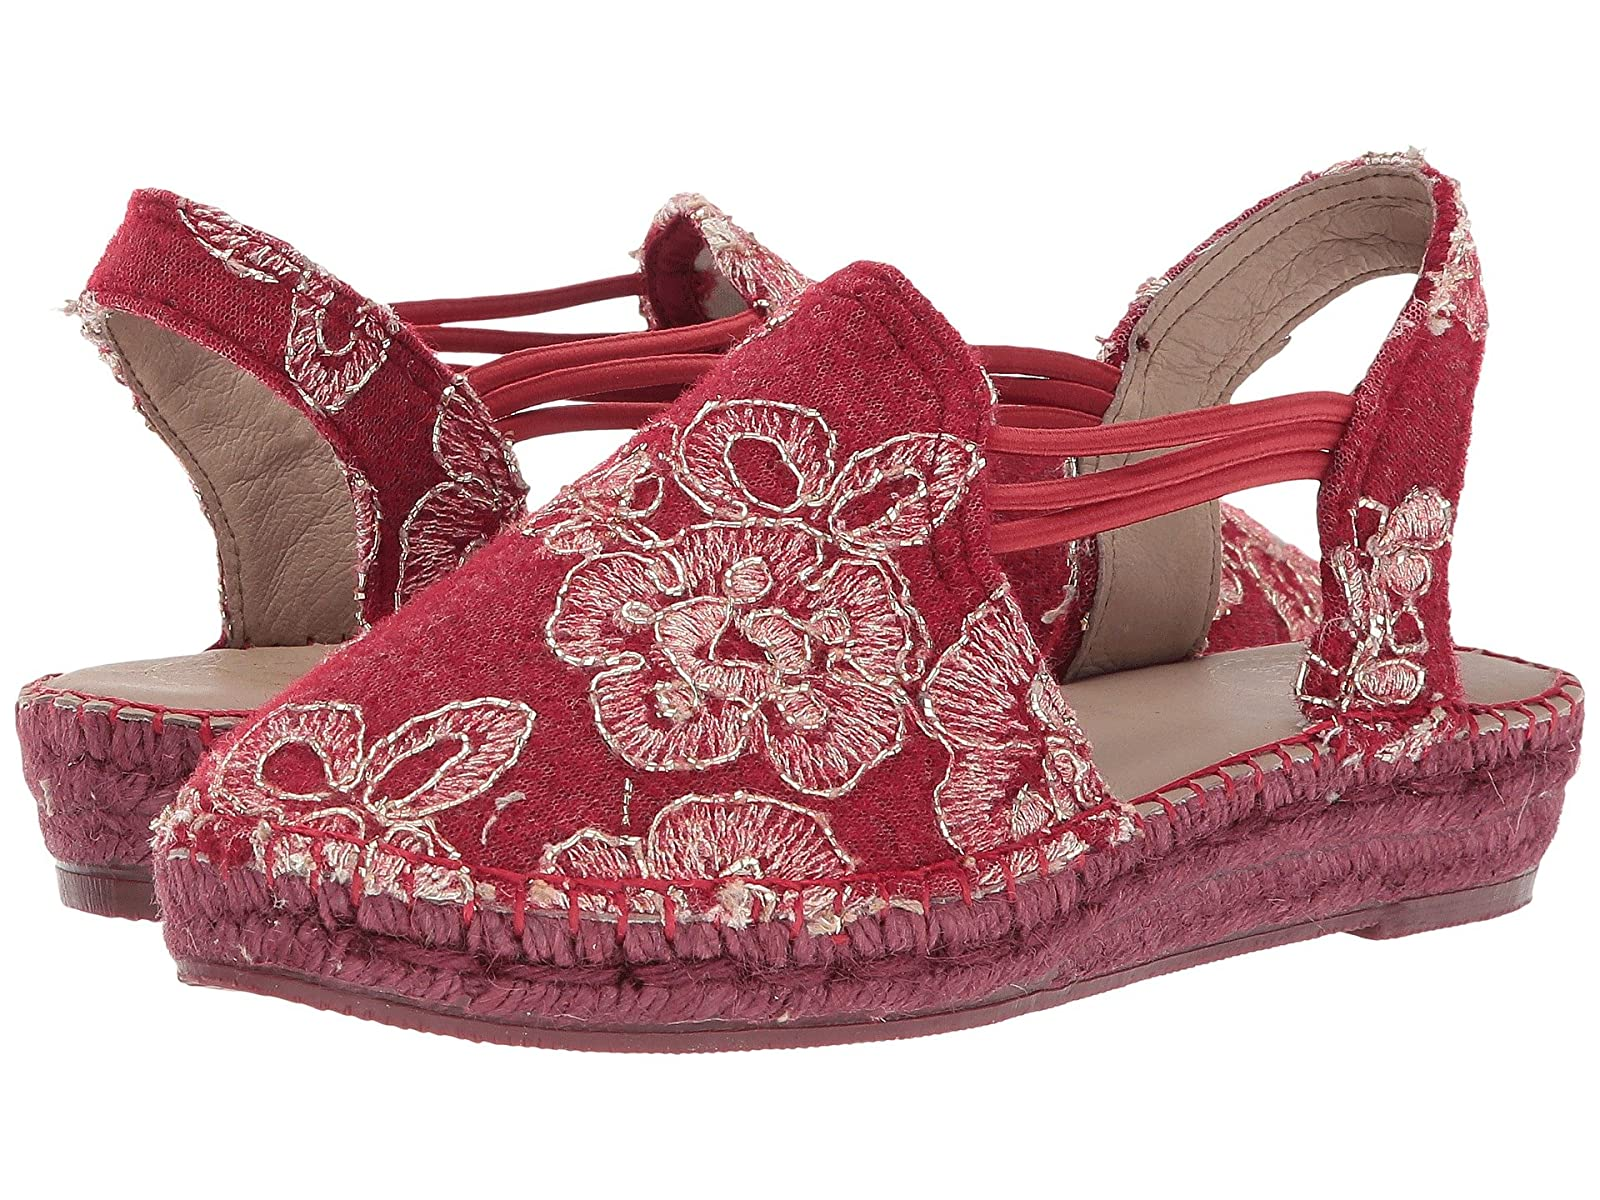 Toni Pons Metz-FlxCheap and distinctive eye-catching shoes